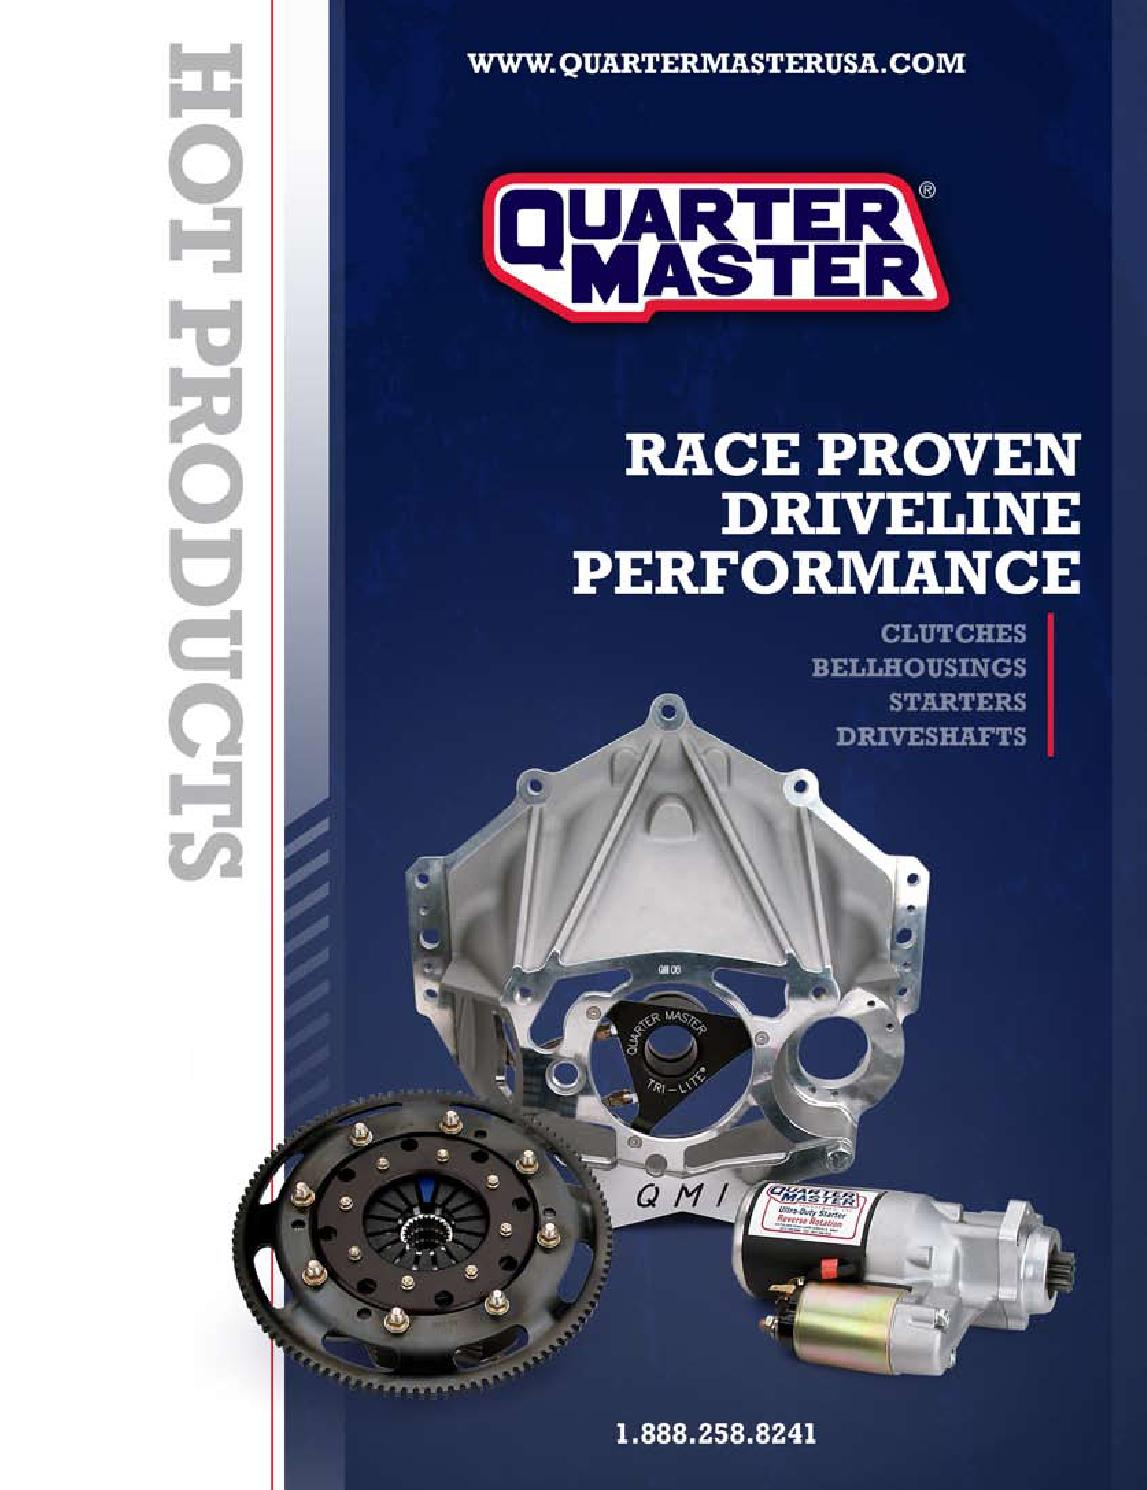 Quarter master 2013 catalog by TMeyer Inc - issuu